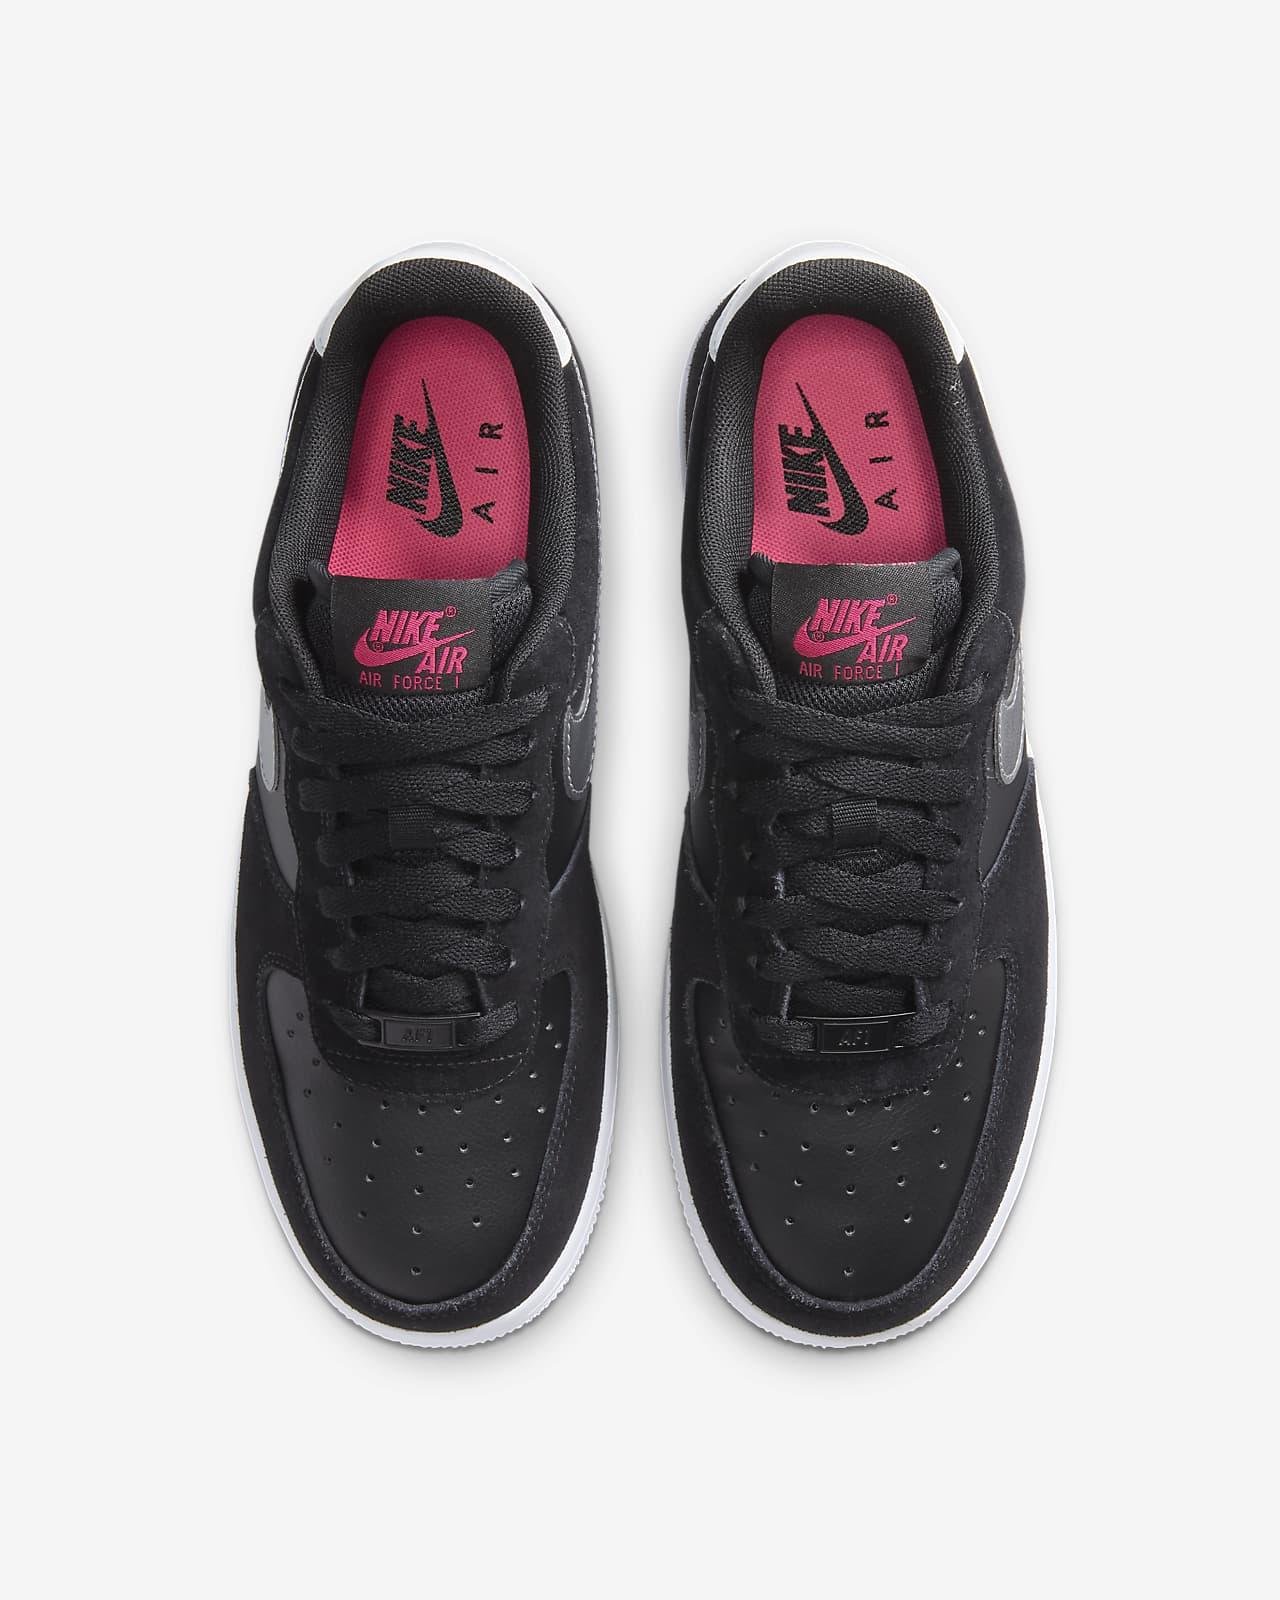 Women's Nike Air Max 1 Pinnacle 'Black'. Nike SNKRS FI